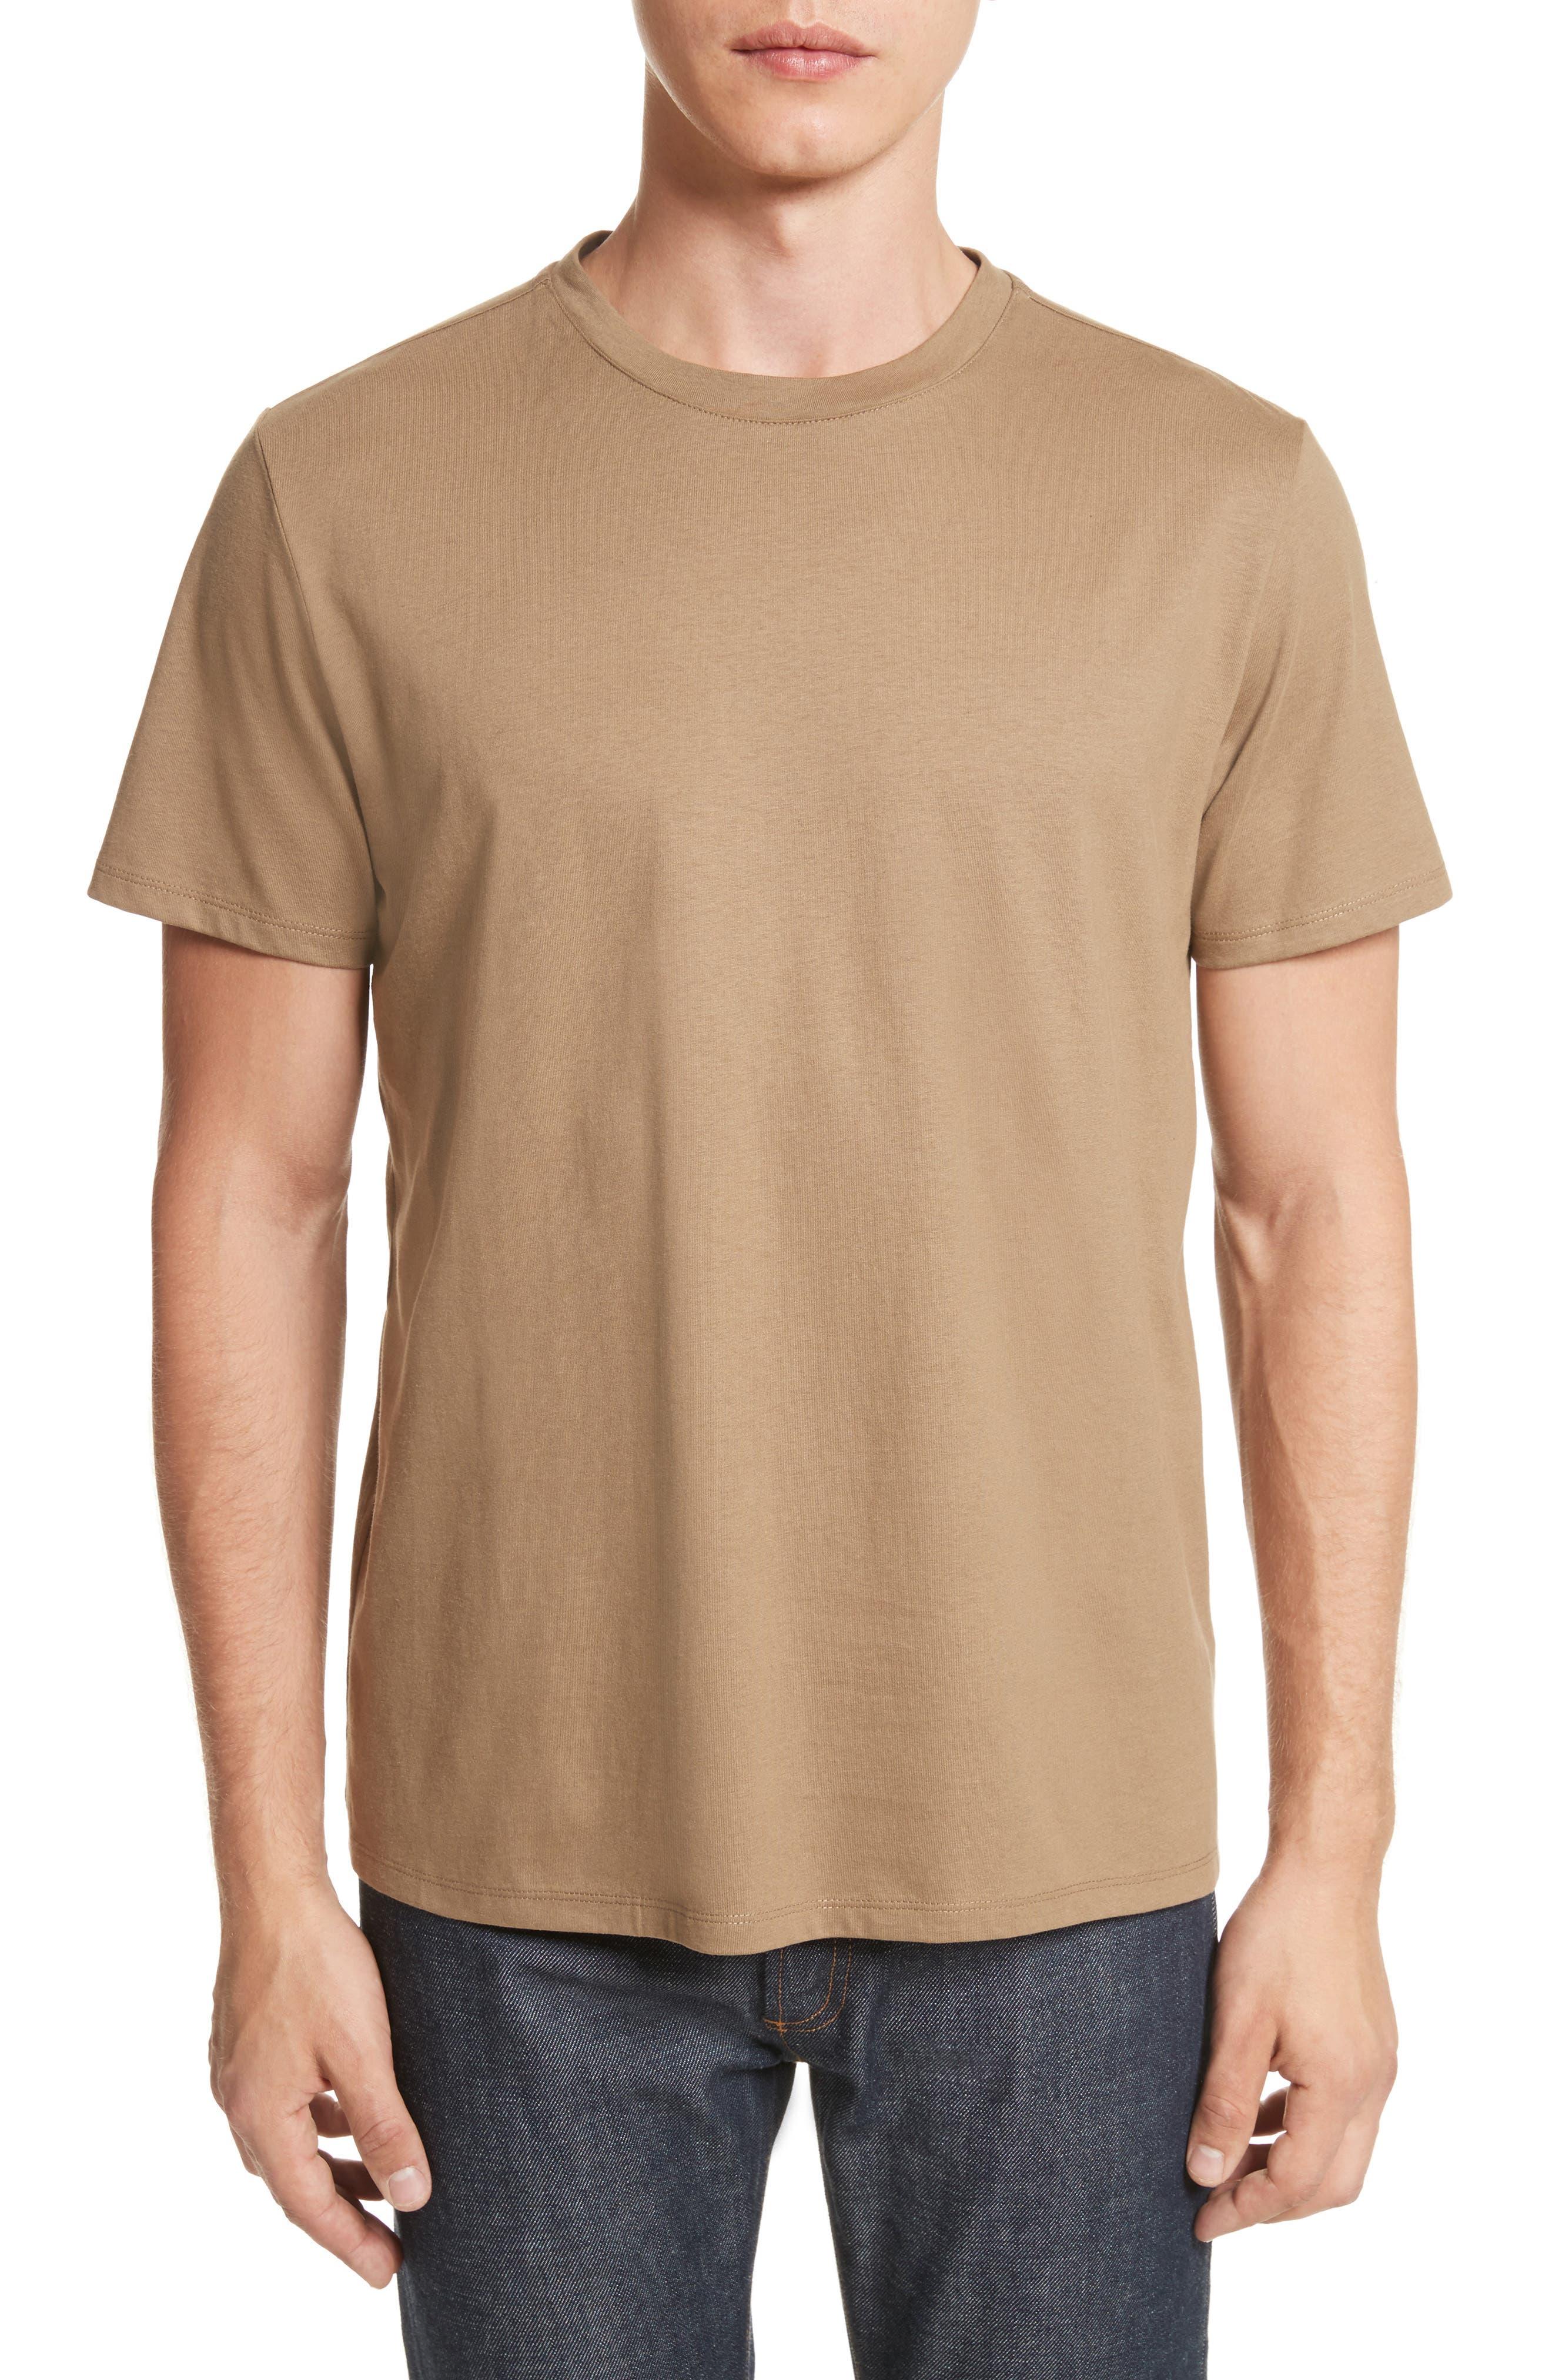 Jimmy T-Shirt,                             Main thumbnail 1, color,                             270